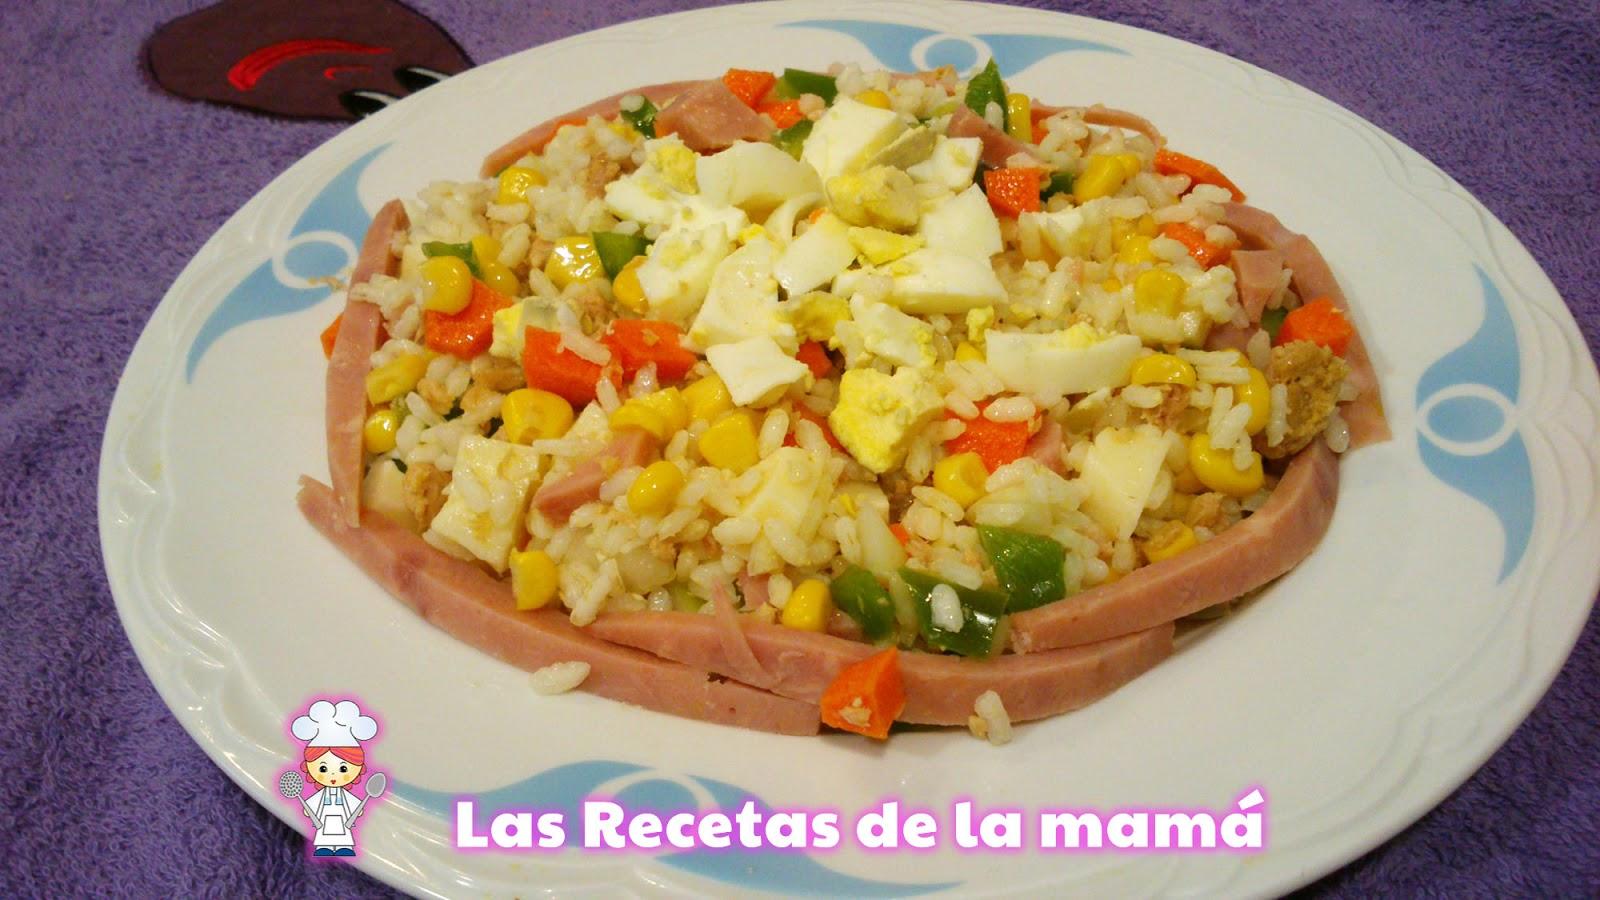 Las recetas de la mam receta de ensalada de arroz primavera - Ensalada de arroz light ...